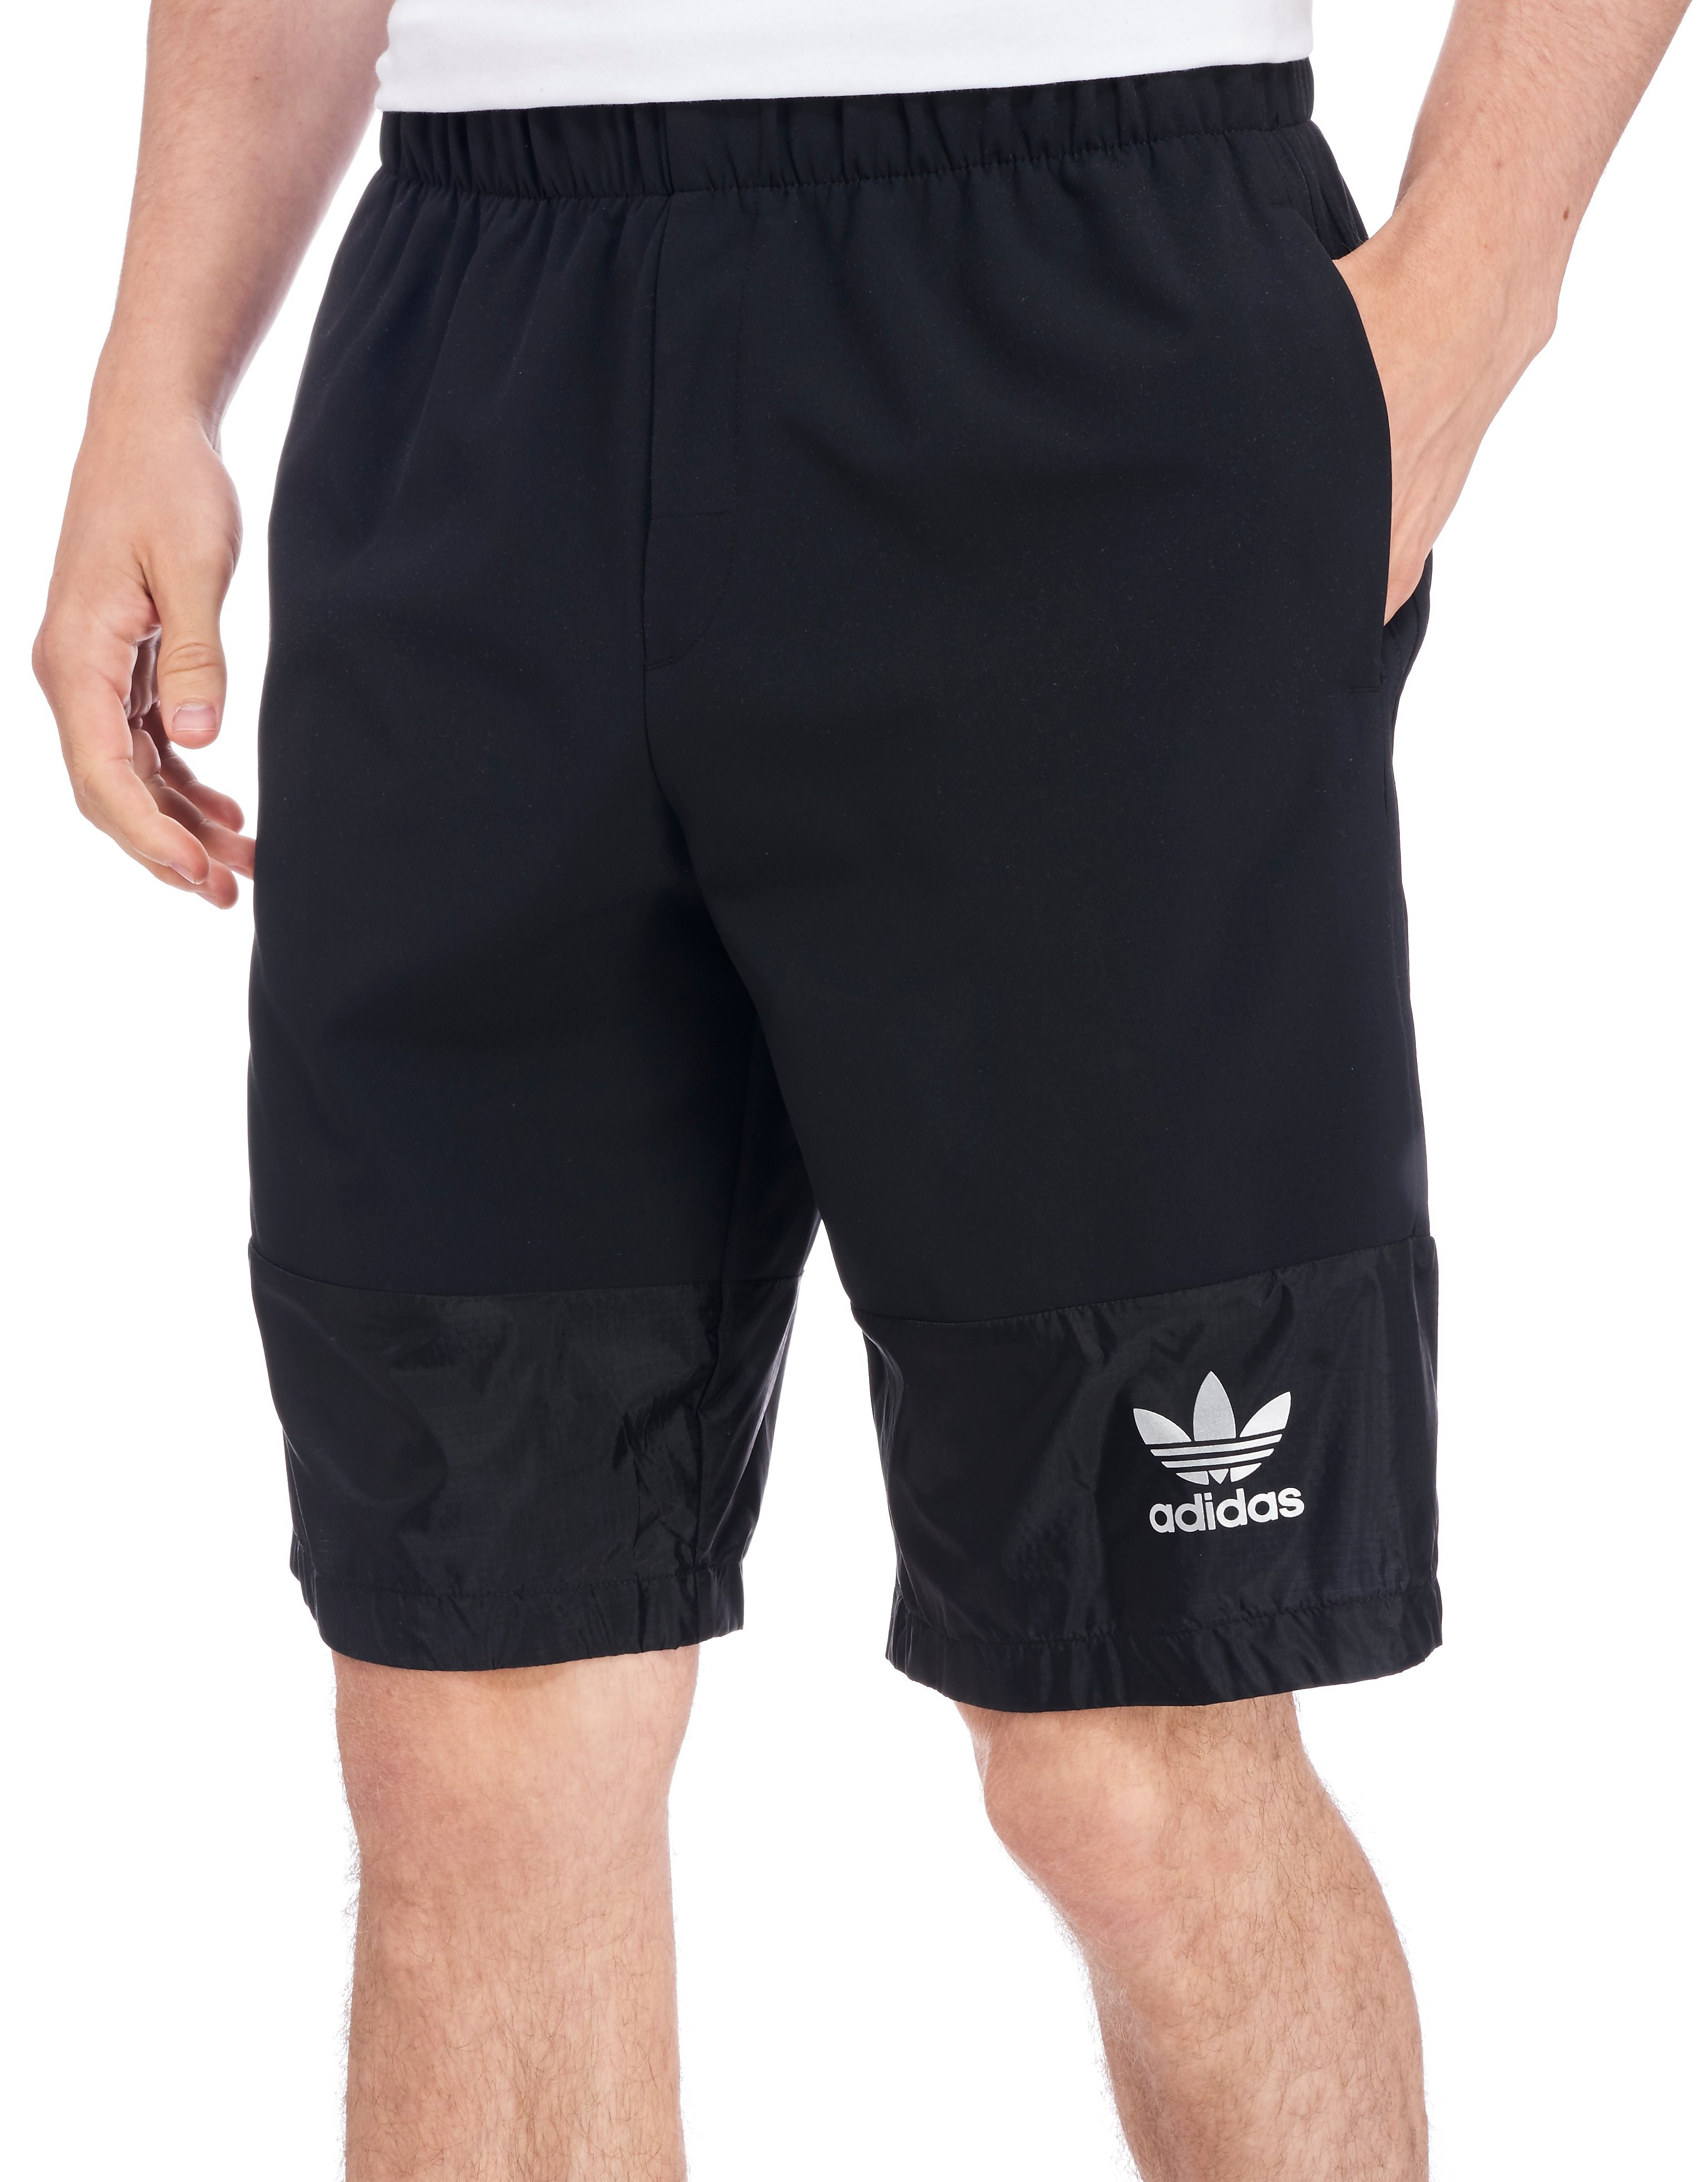 adidas Originals Run Shorts